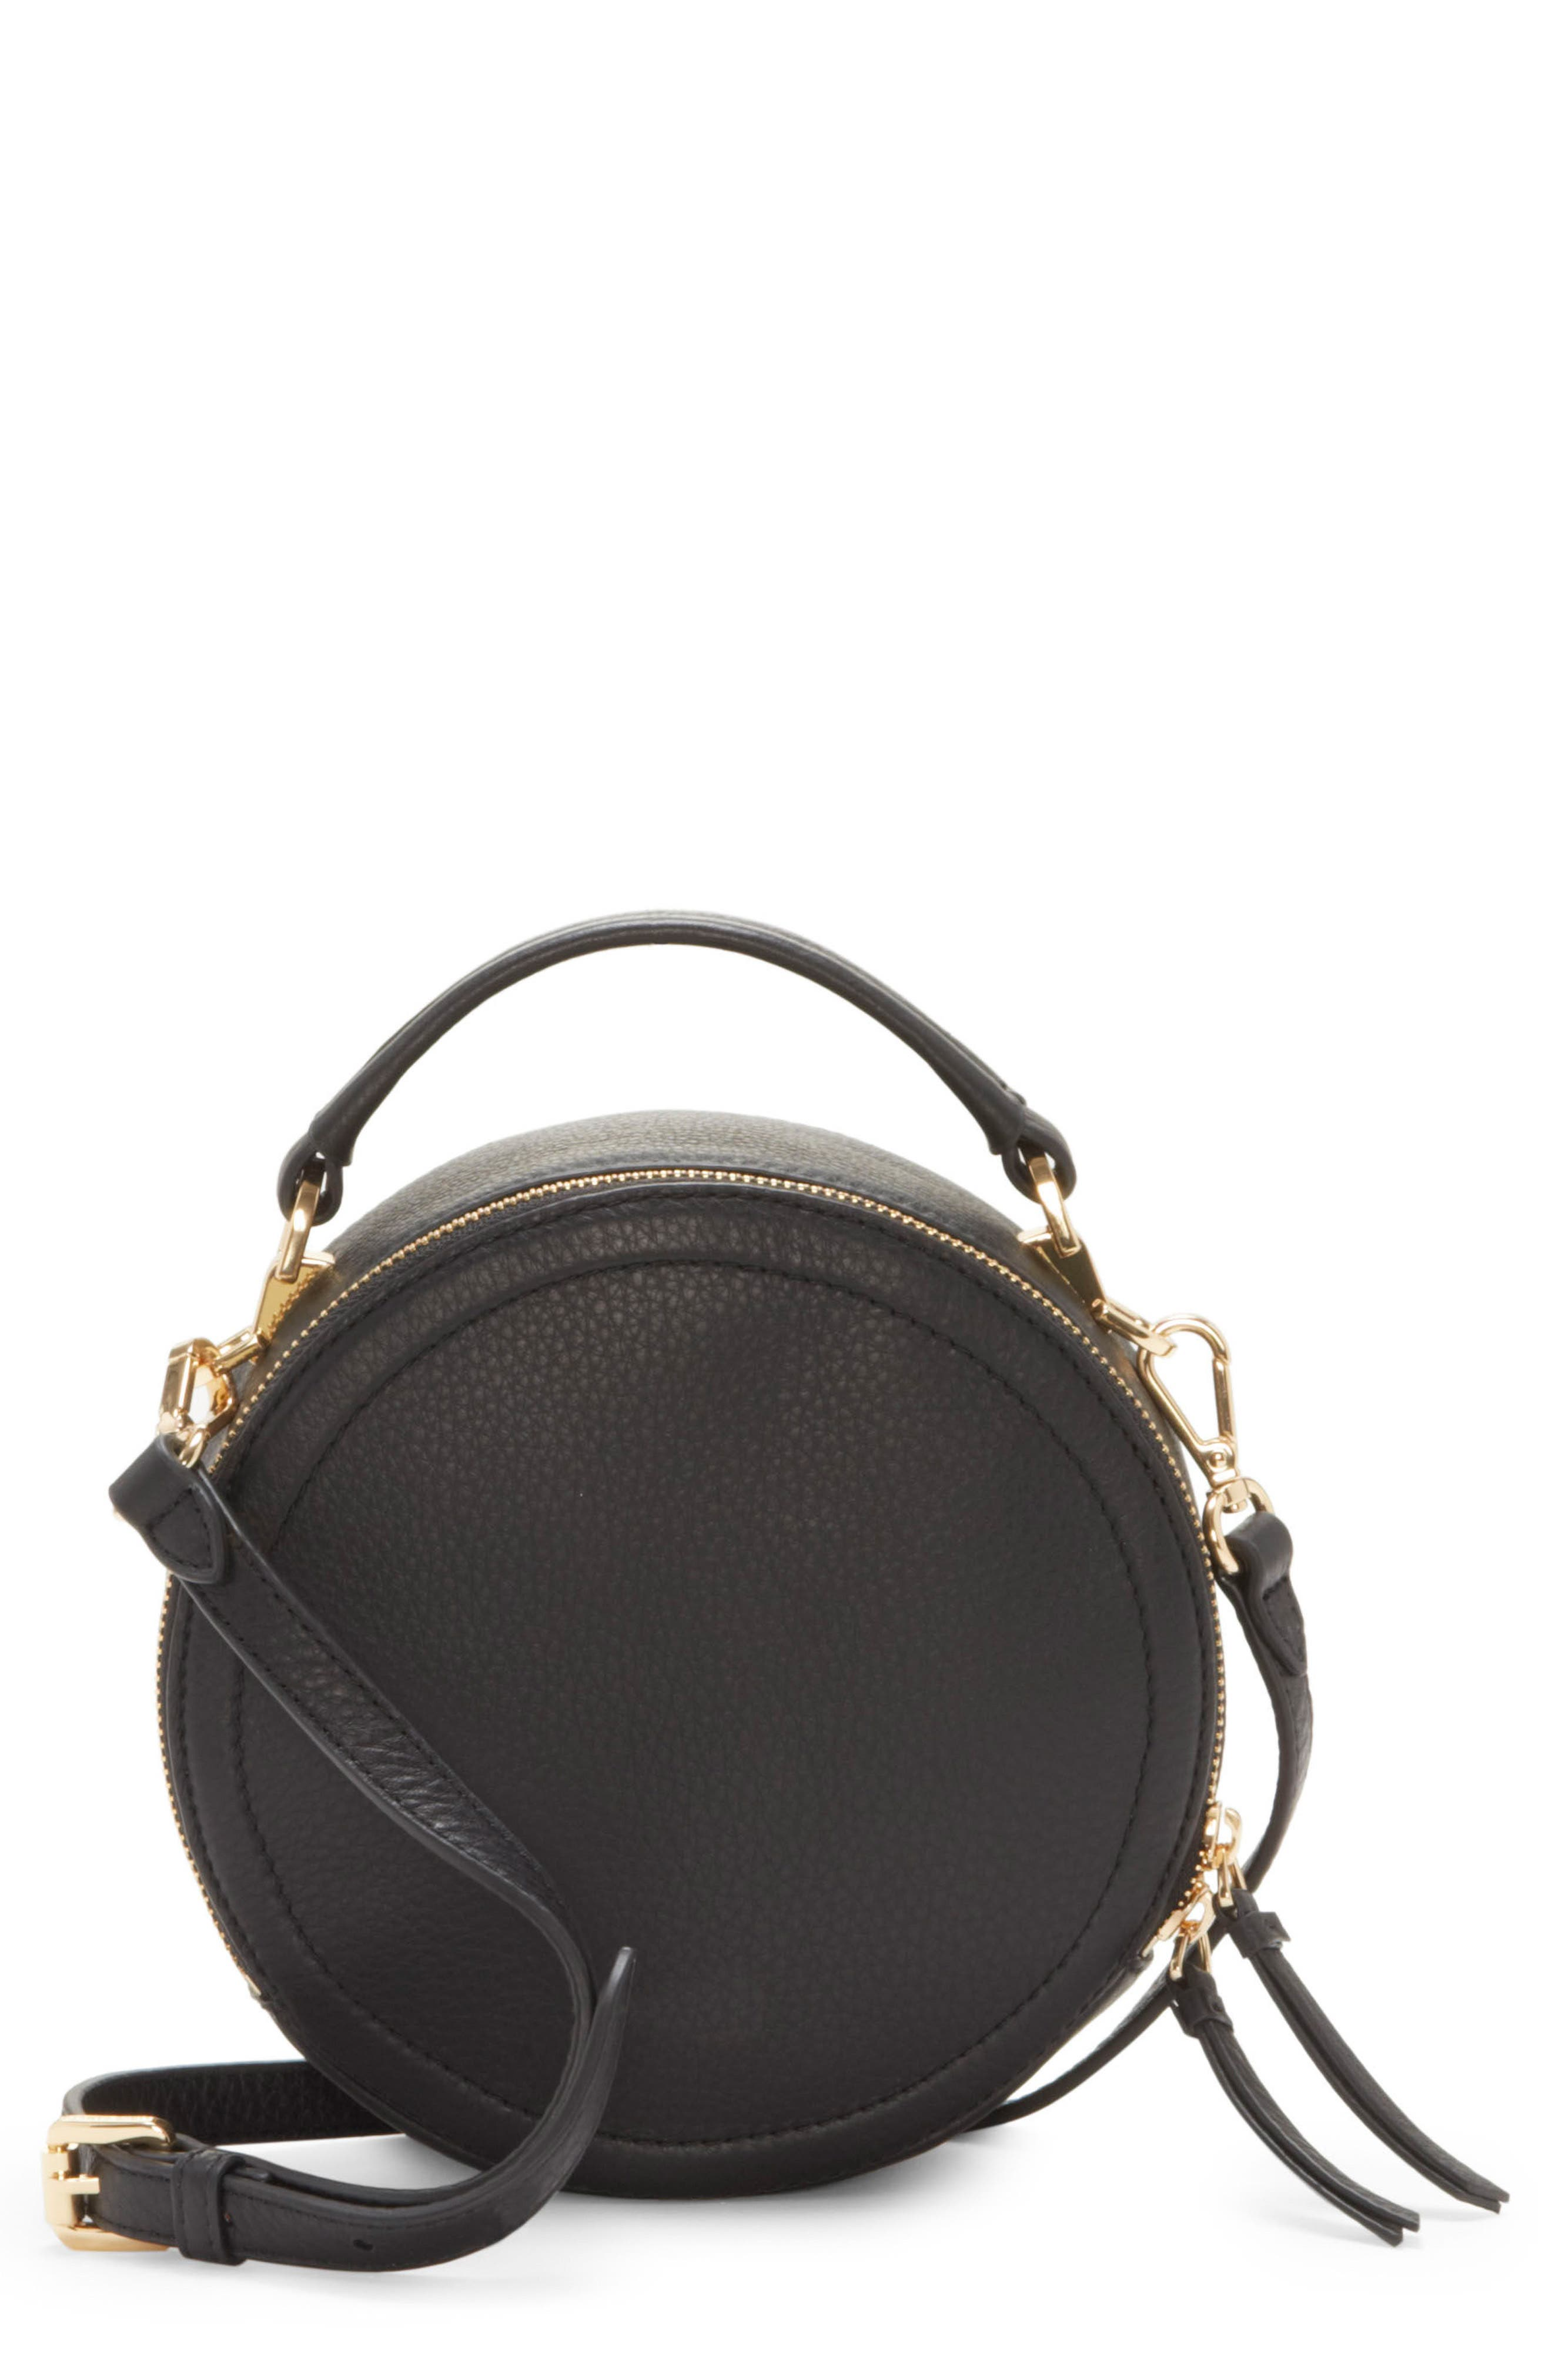 Bray Leather Crossbody Bag,                             Main thumbnail 1, color,                             Black